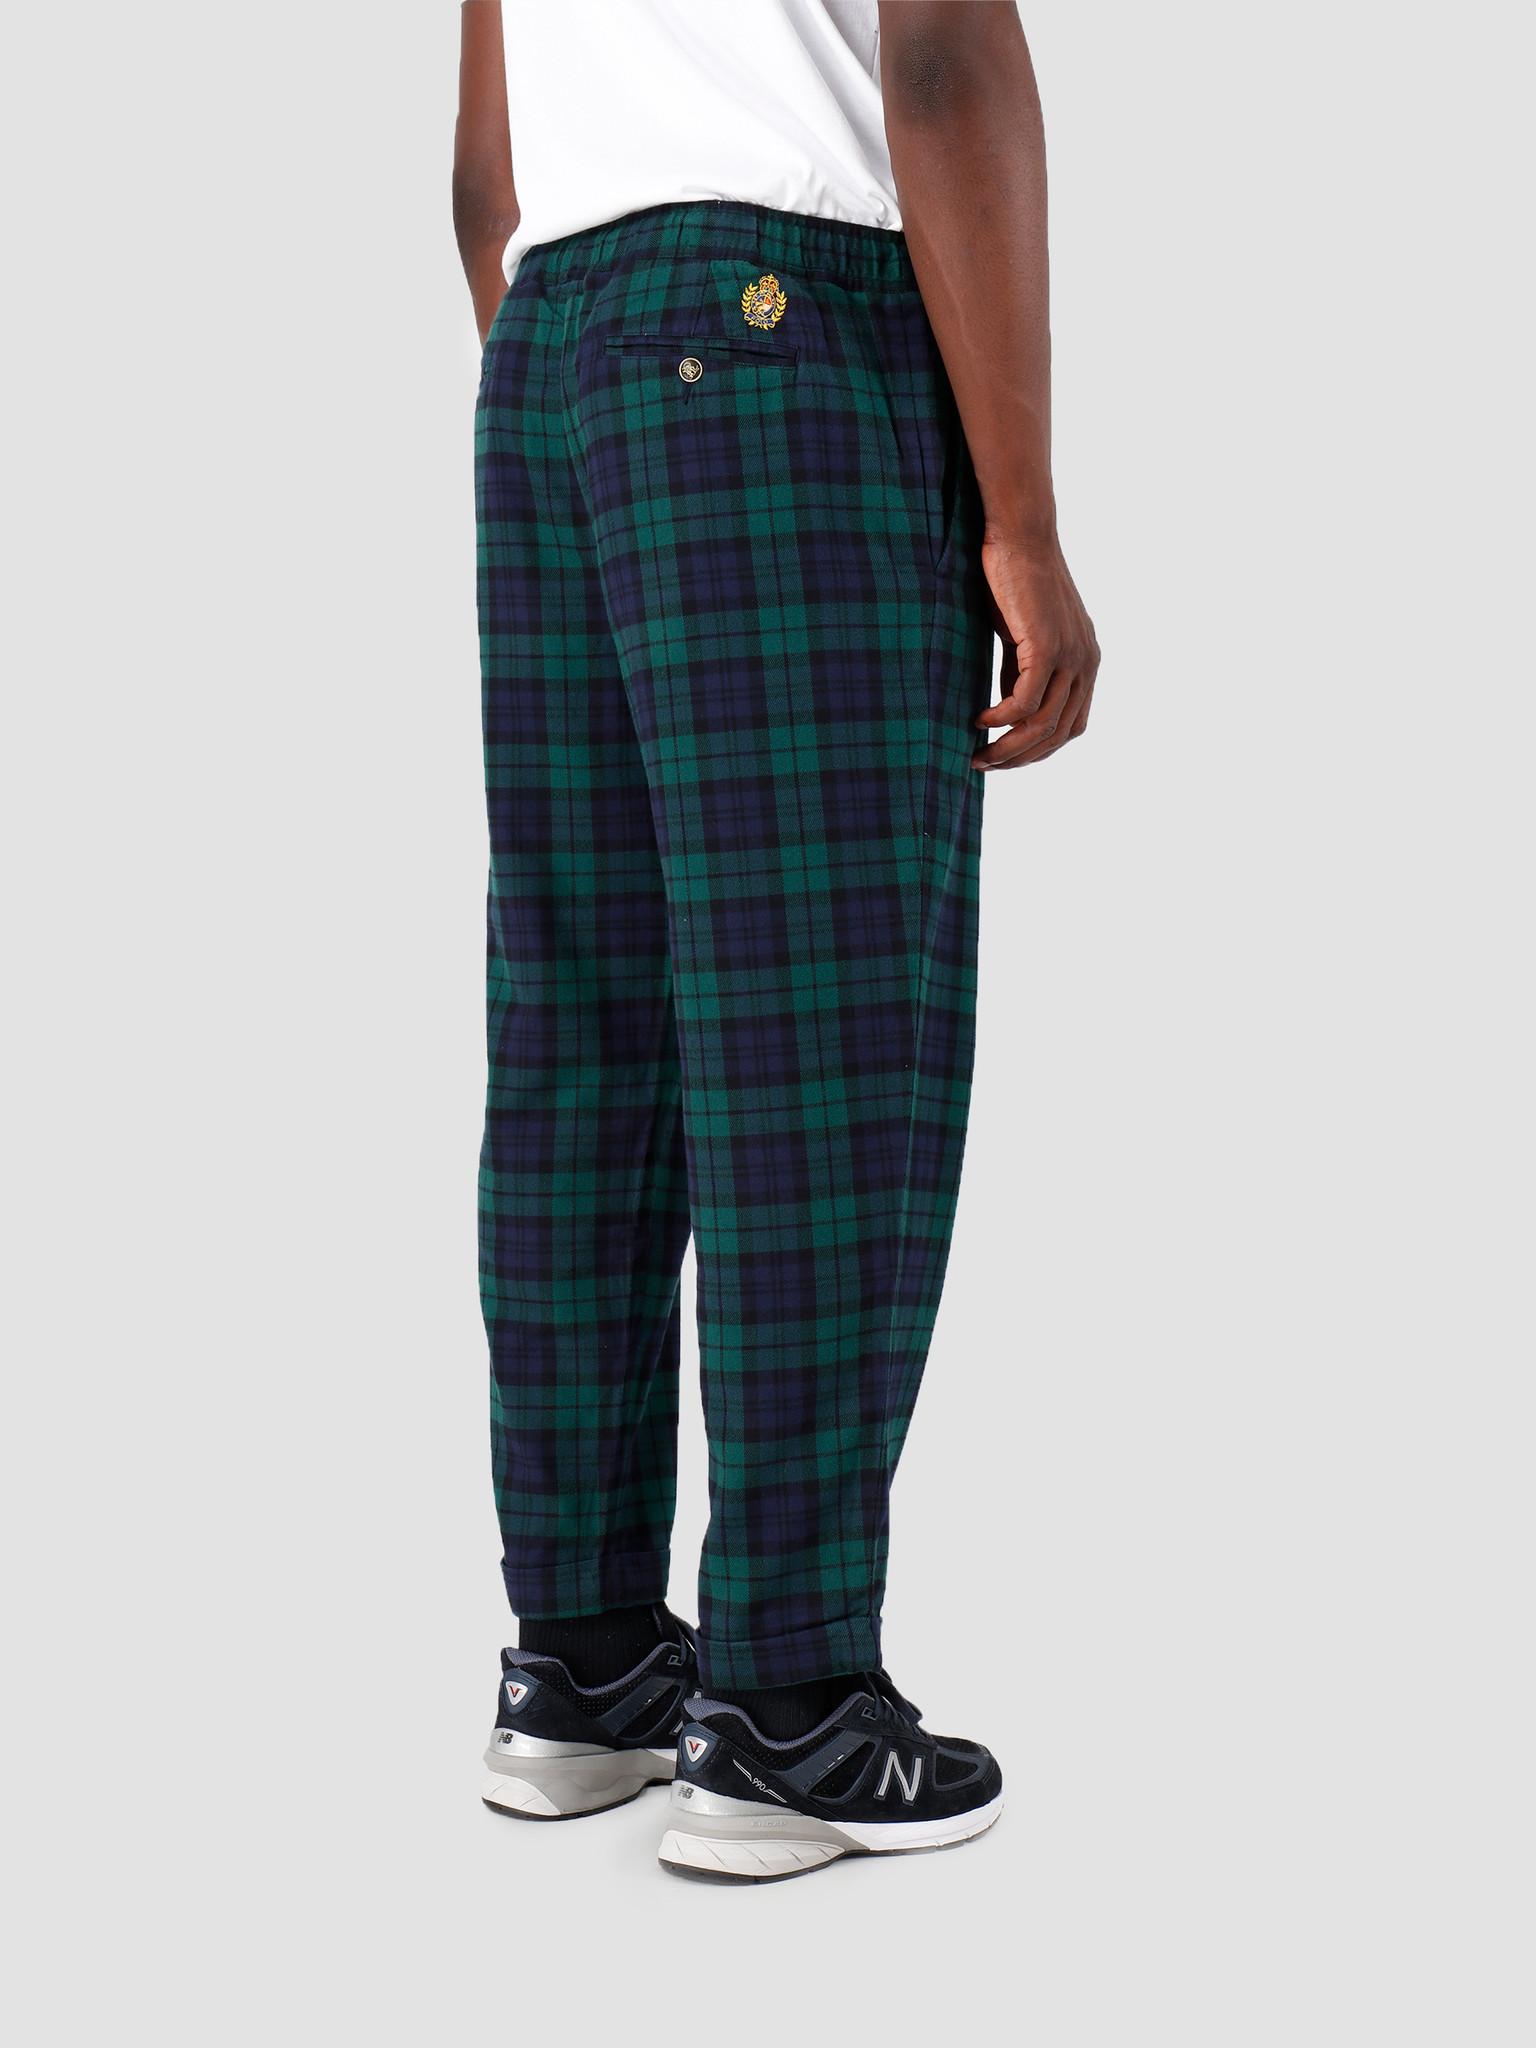 Polo Ralph Lauren Polo Ralph Lauren Relaxed Fit Graduate V2 Pant Black 710759754002